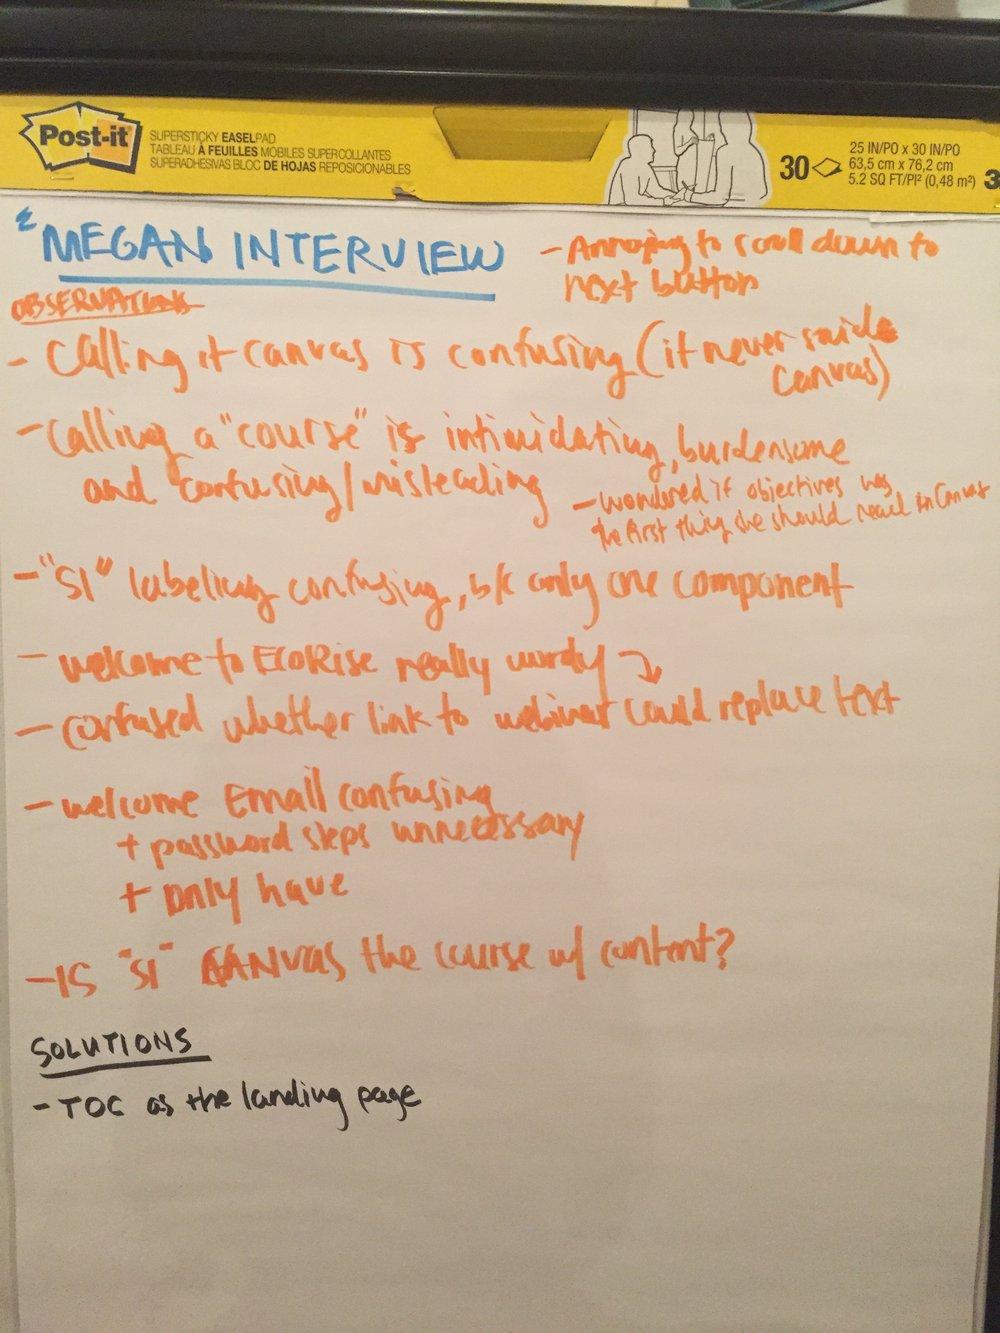 Observations from teacher interview